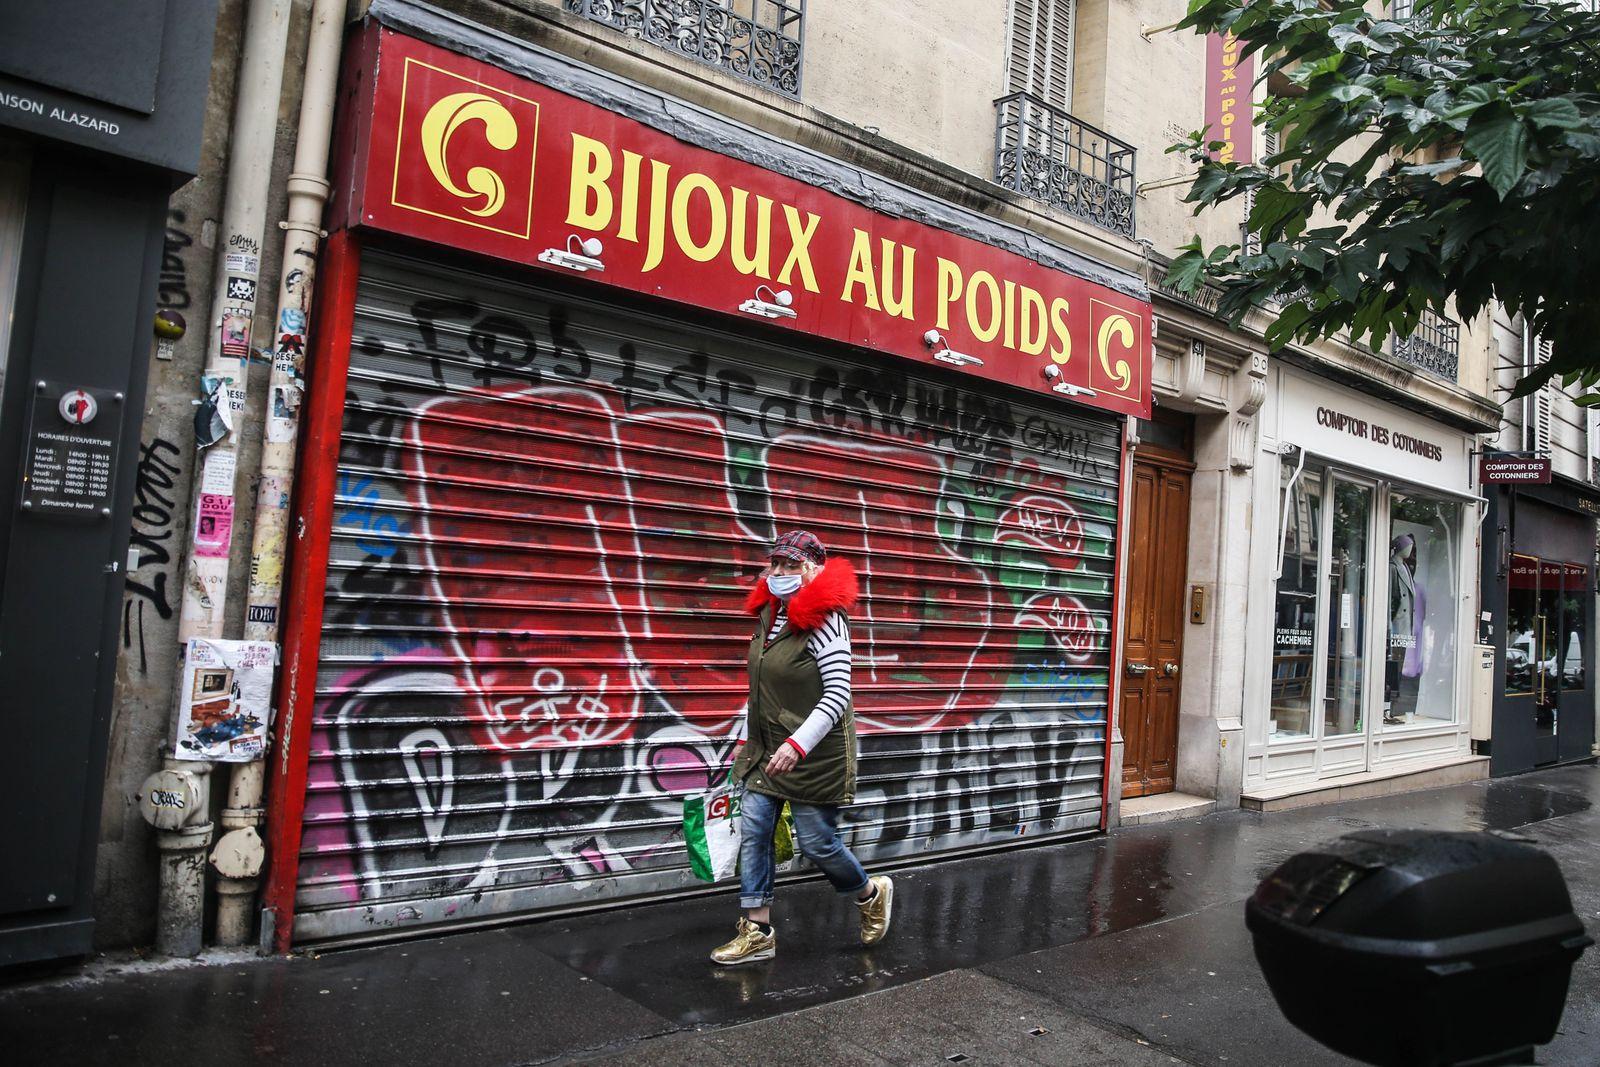 France goes into second lockdown, Paris - 02 Nov 2020